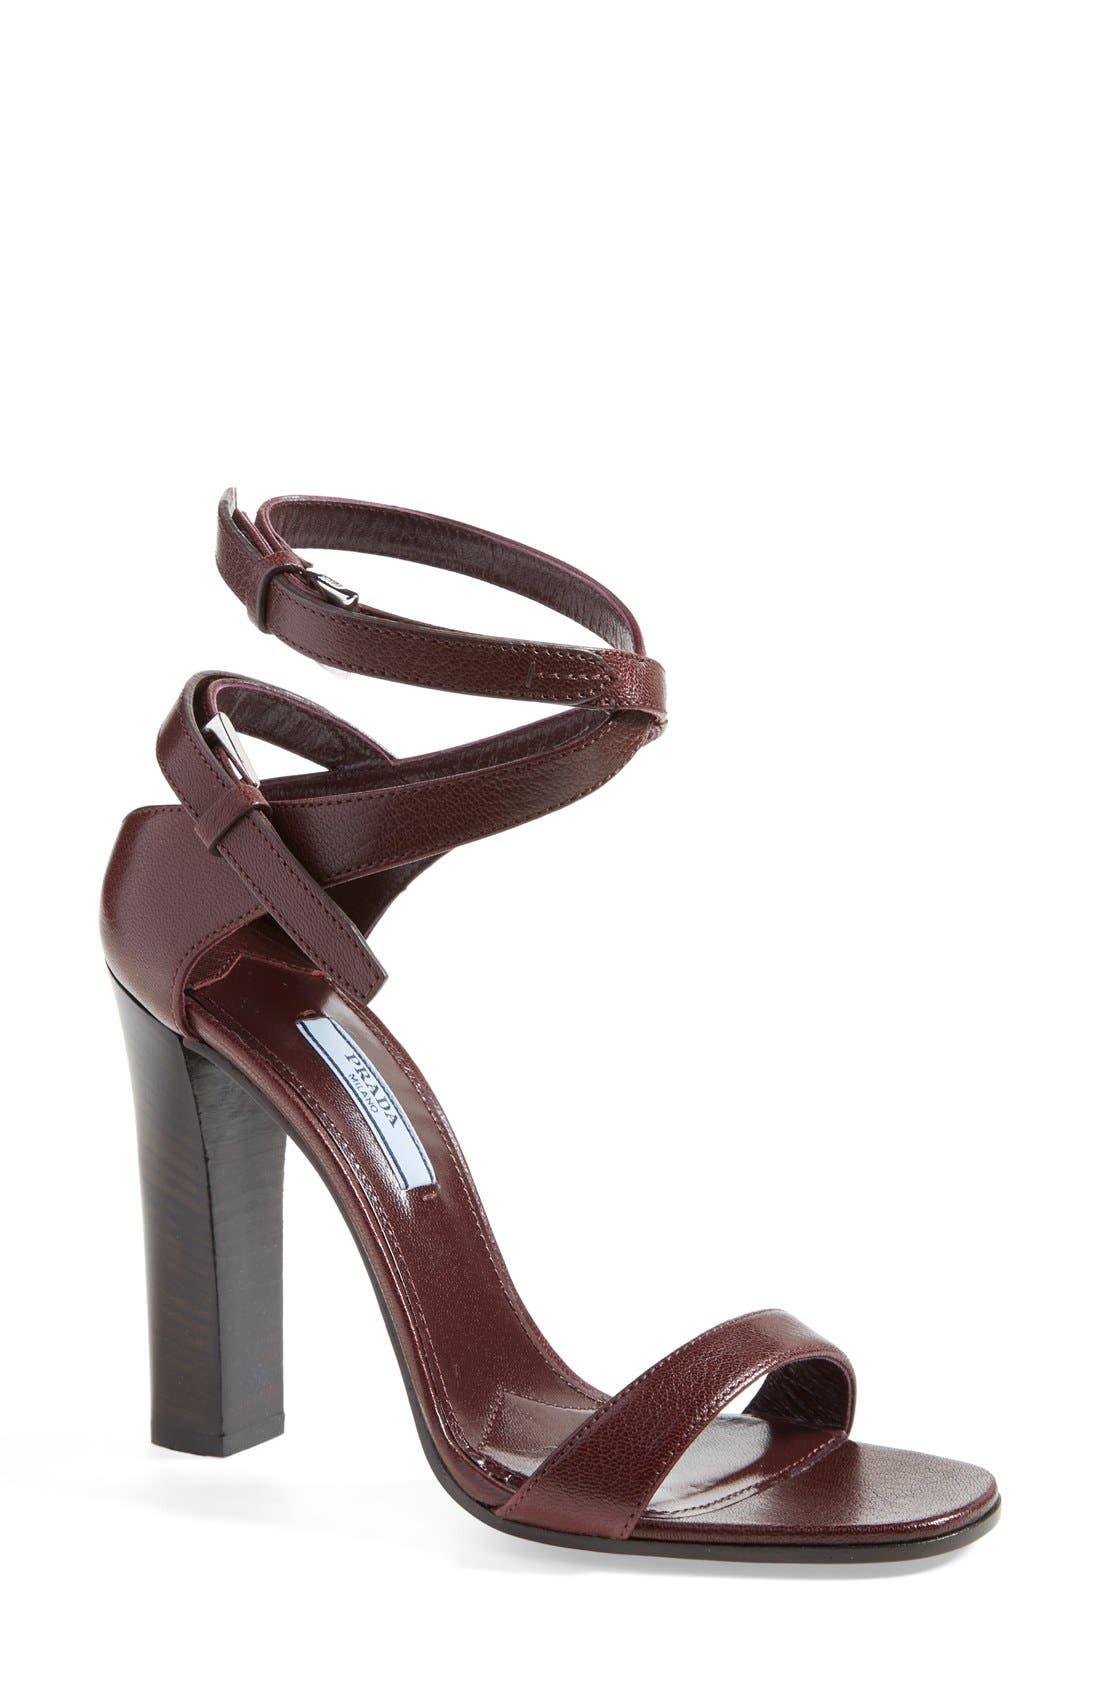 Alternate Image 1 Selected - Prada Double Ankle Strap Sandal (Women)